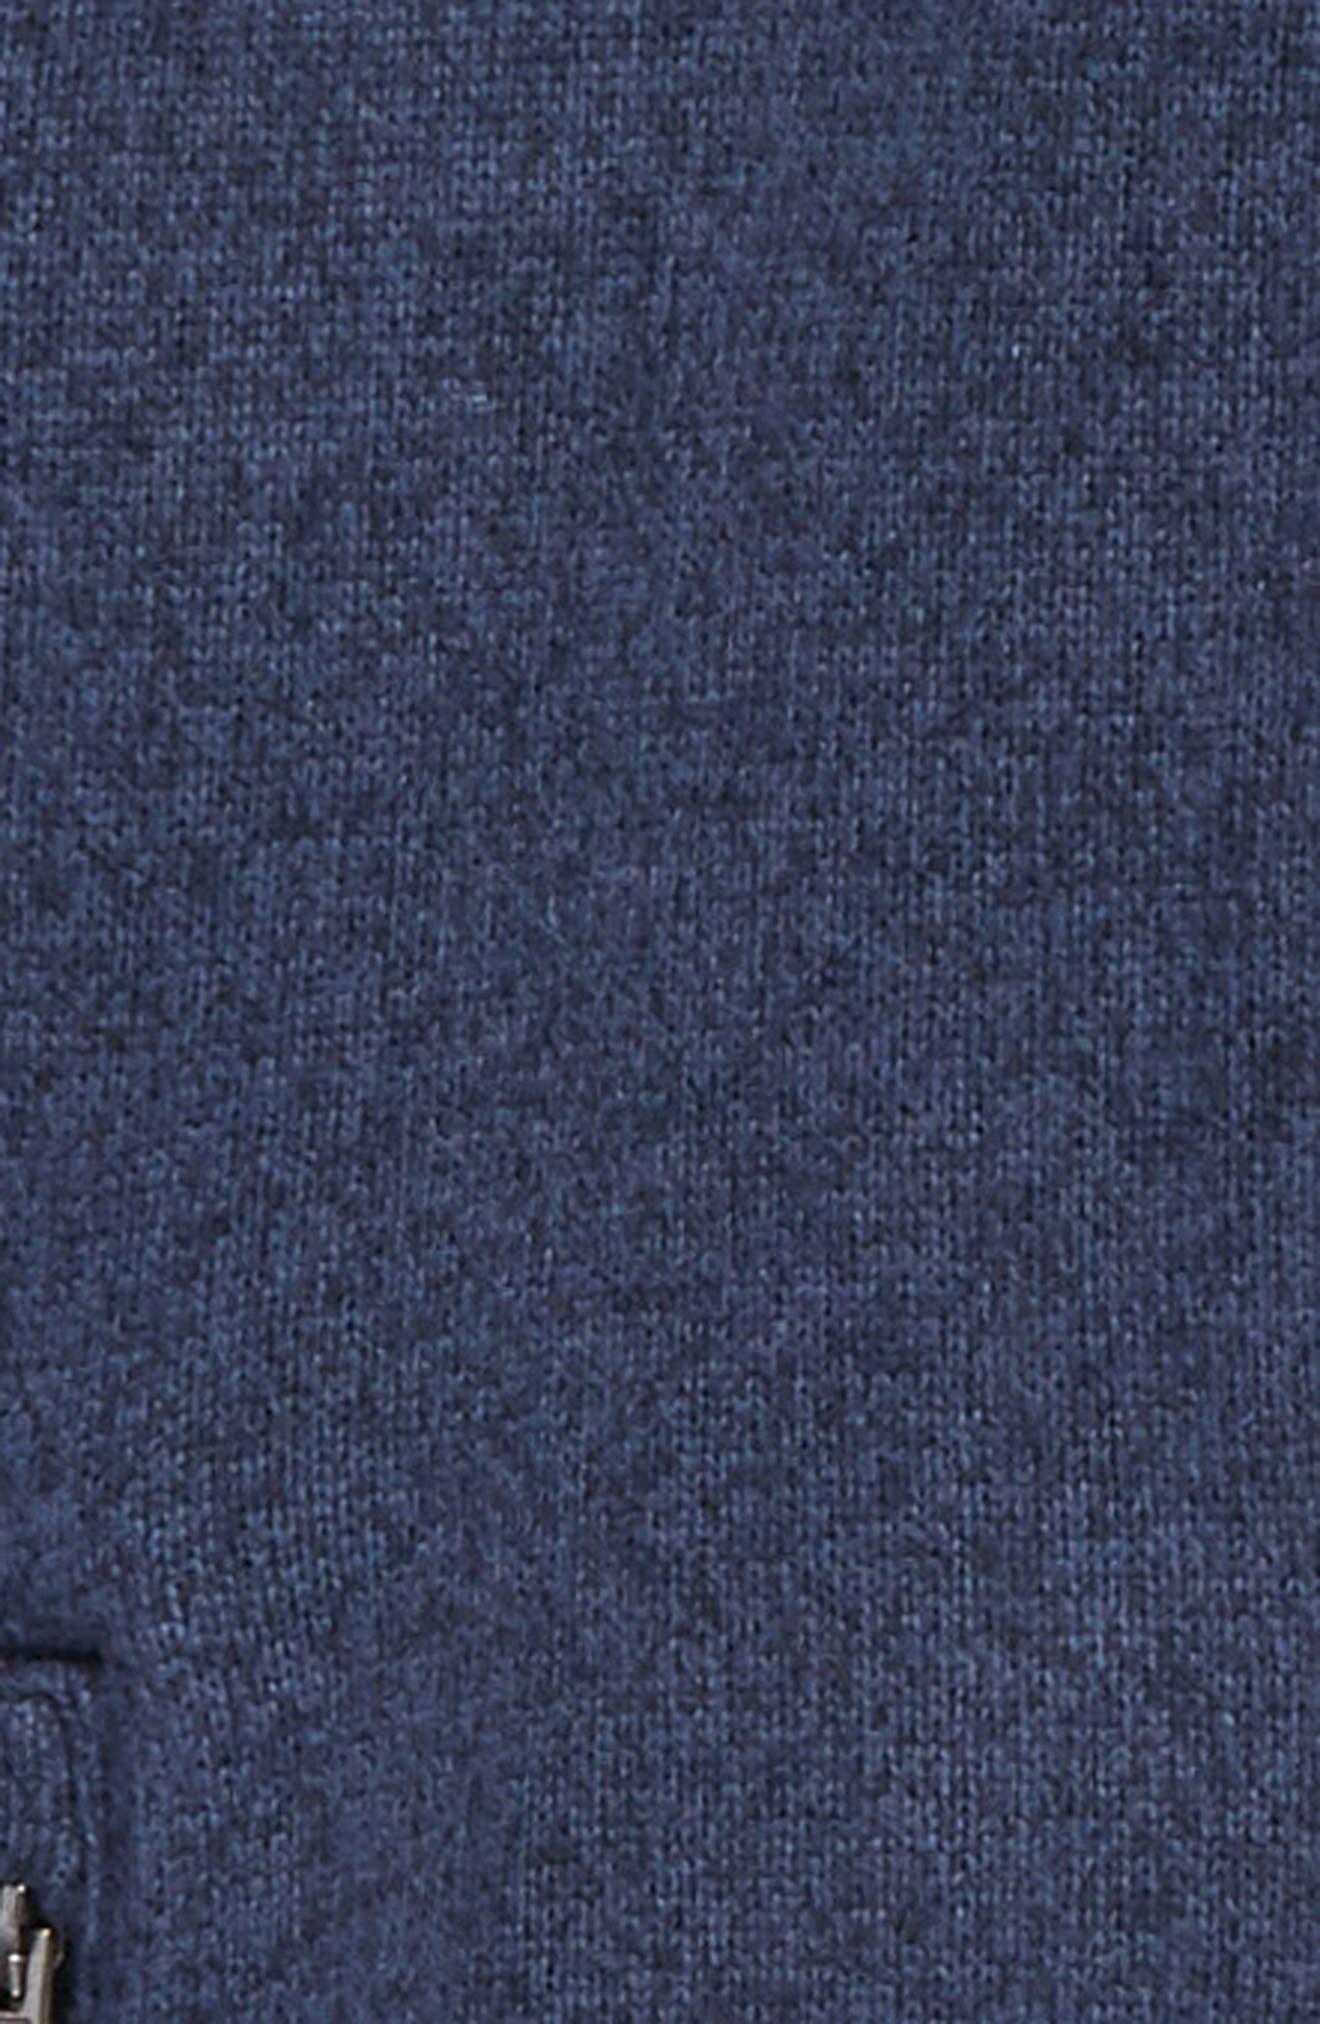 Gordon Lyons Sweater Fleece Zip Jacket,                             Alternate thumbnail 2, color,                             Cosmic Blue Heather